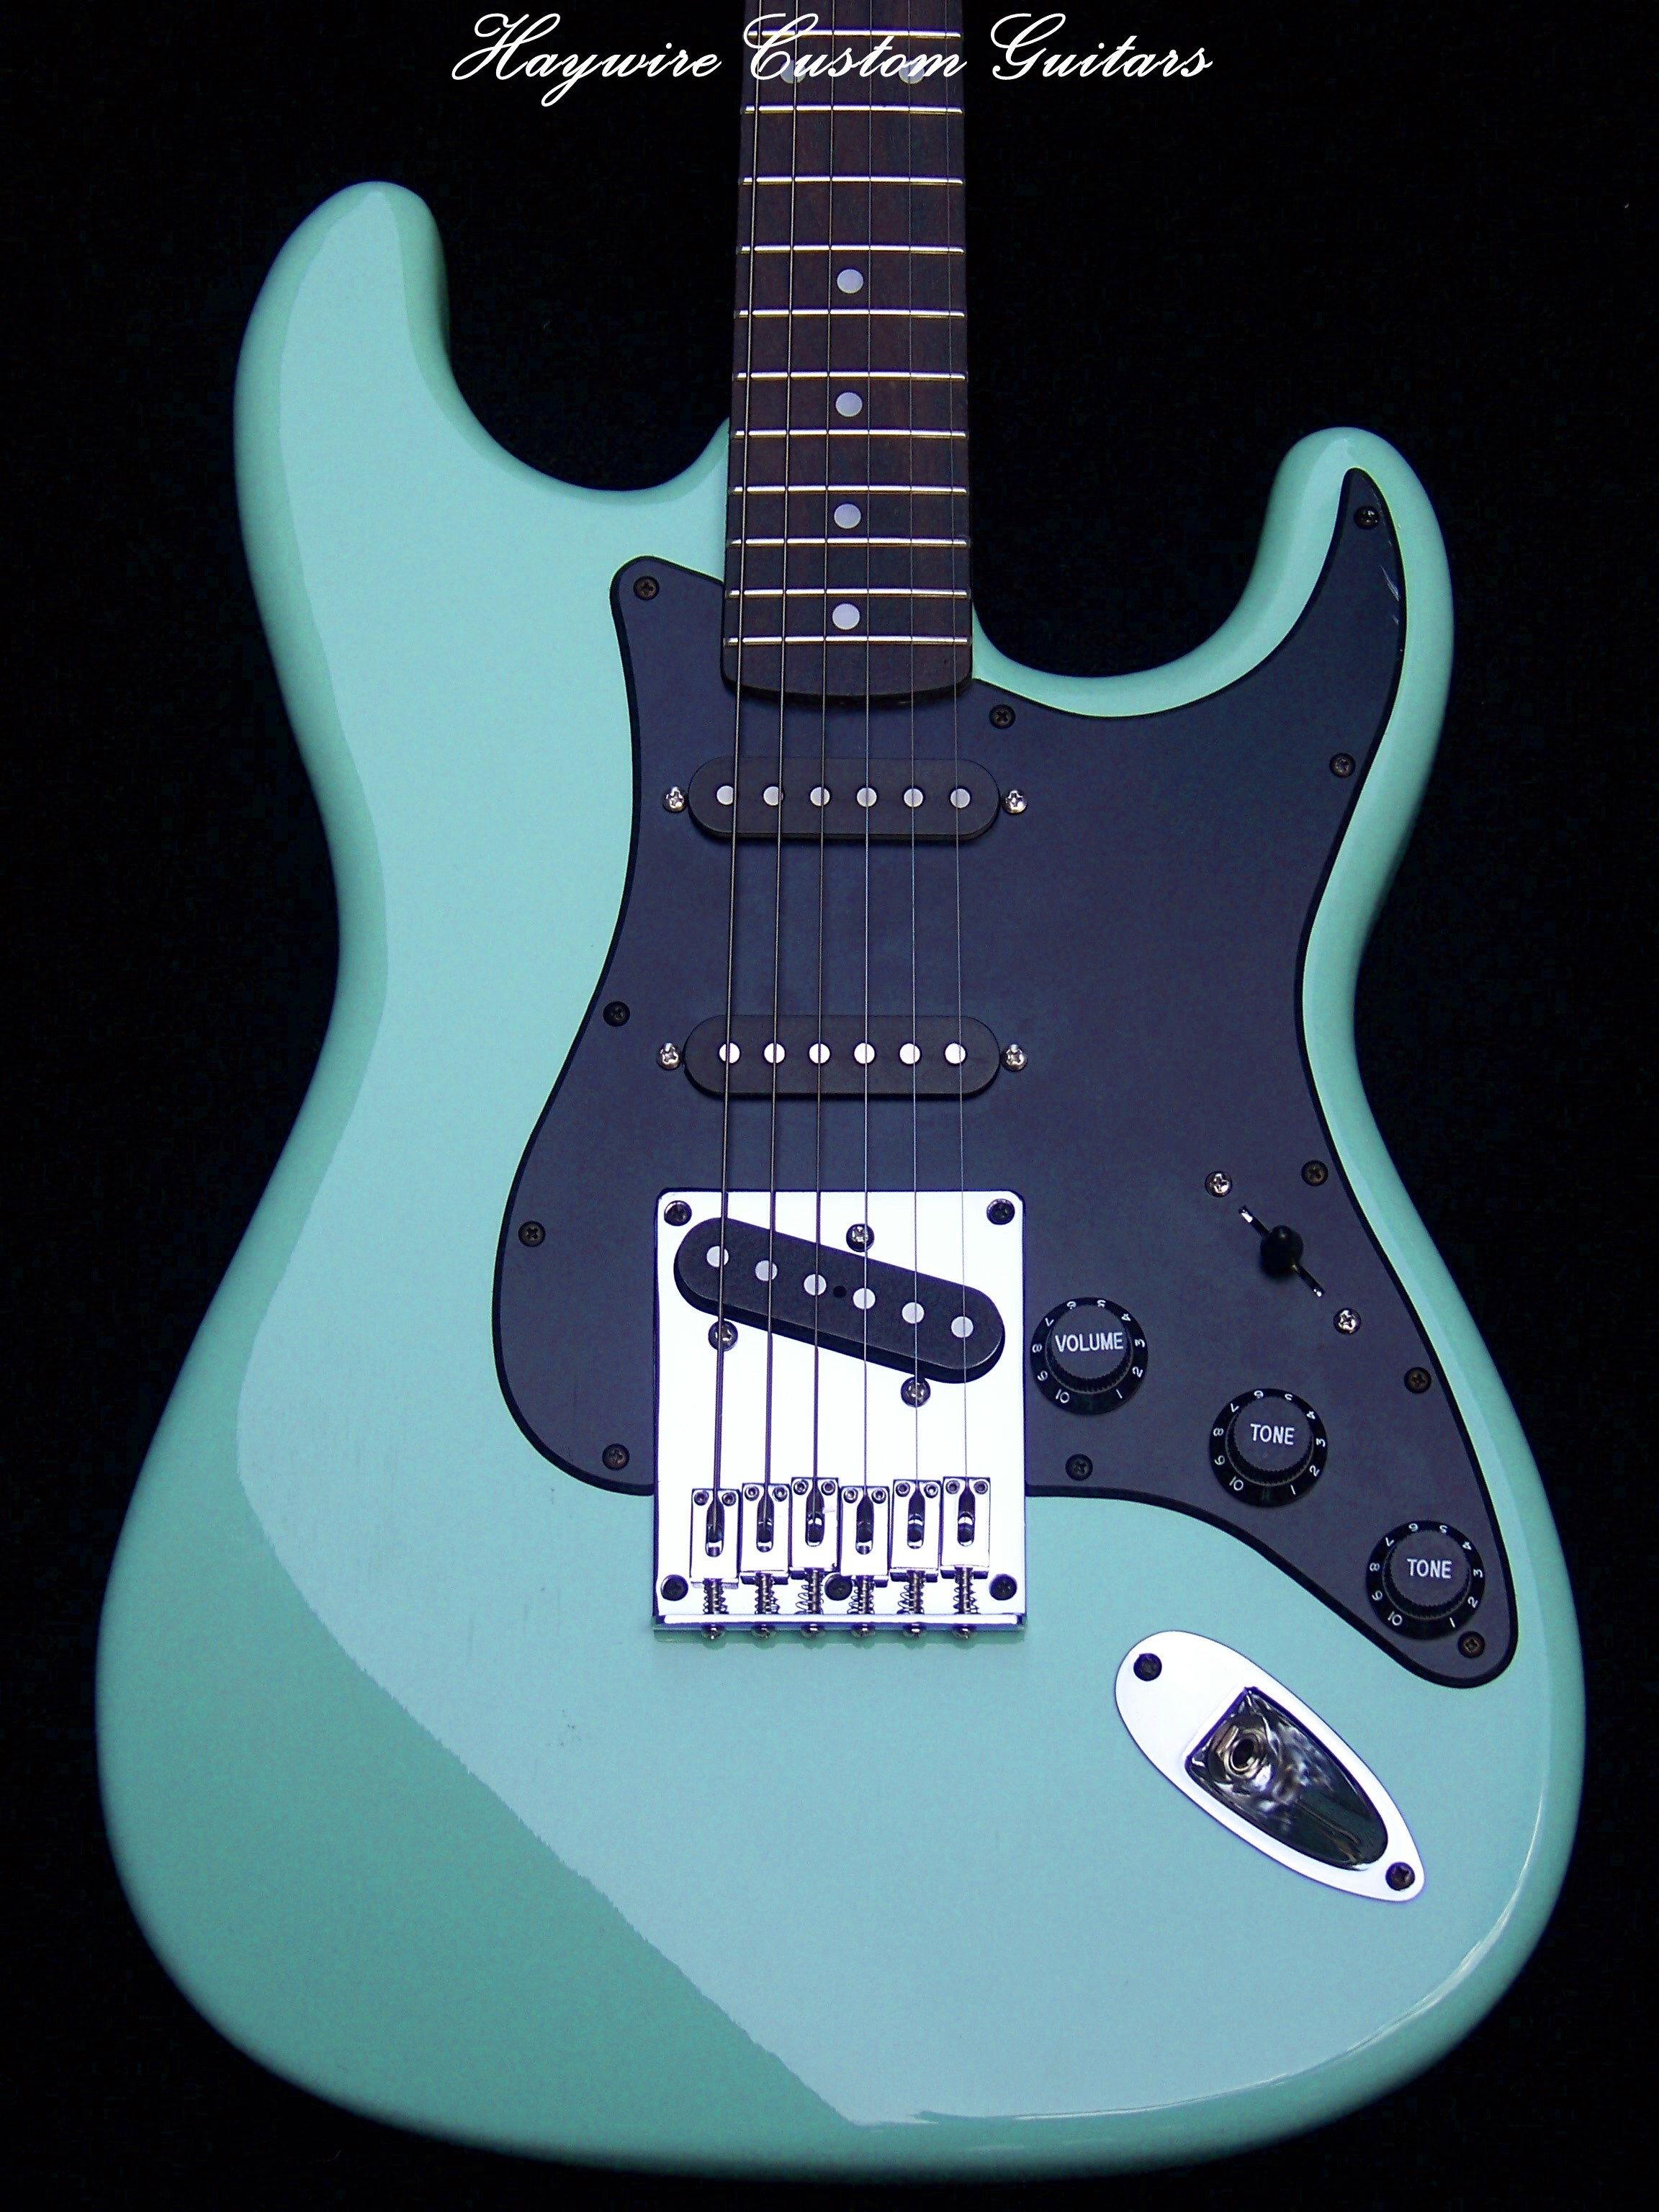 image Haywire Custom Guitars-Nashville Player-#1